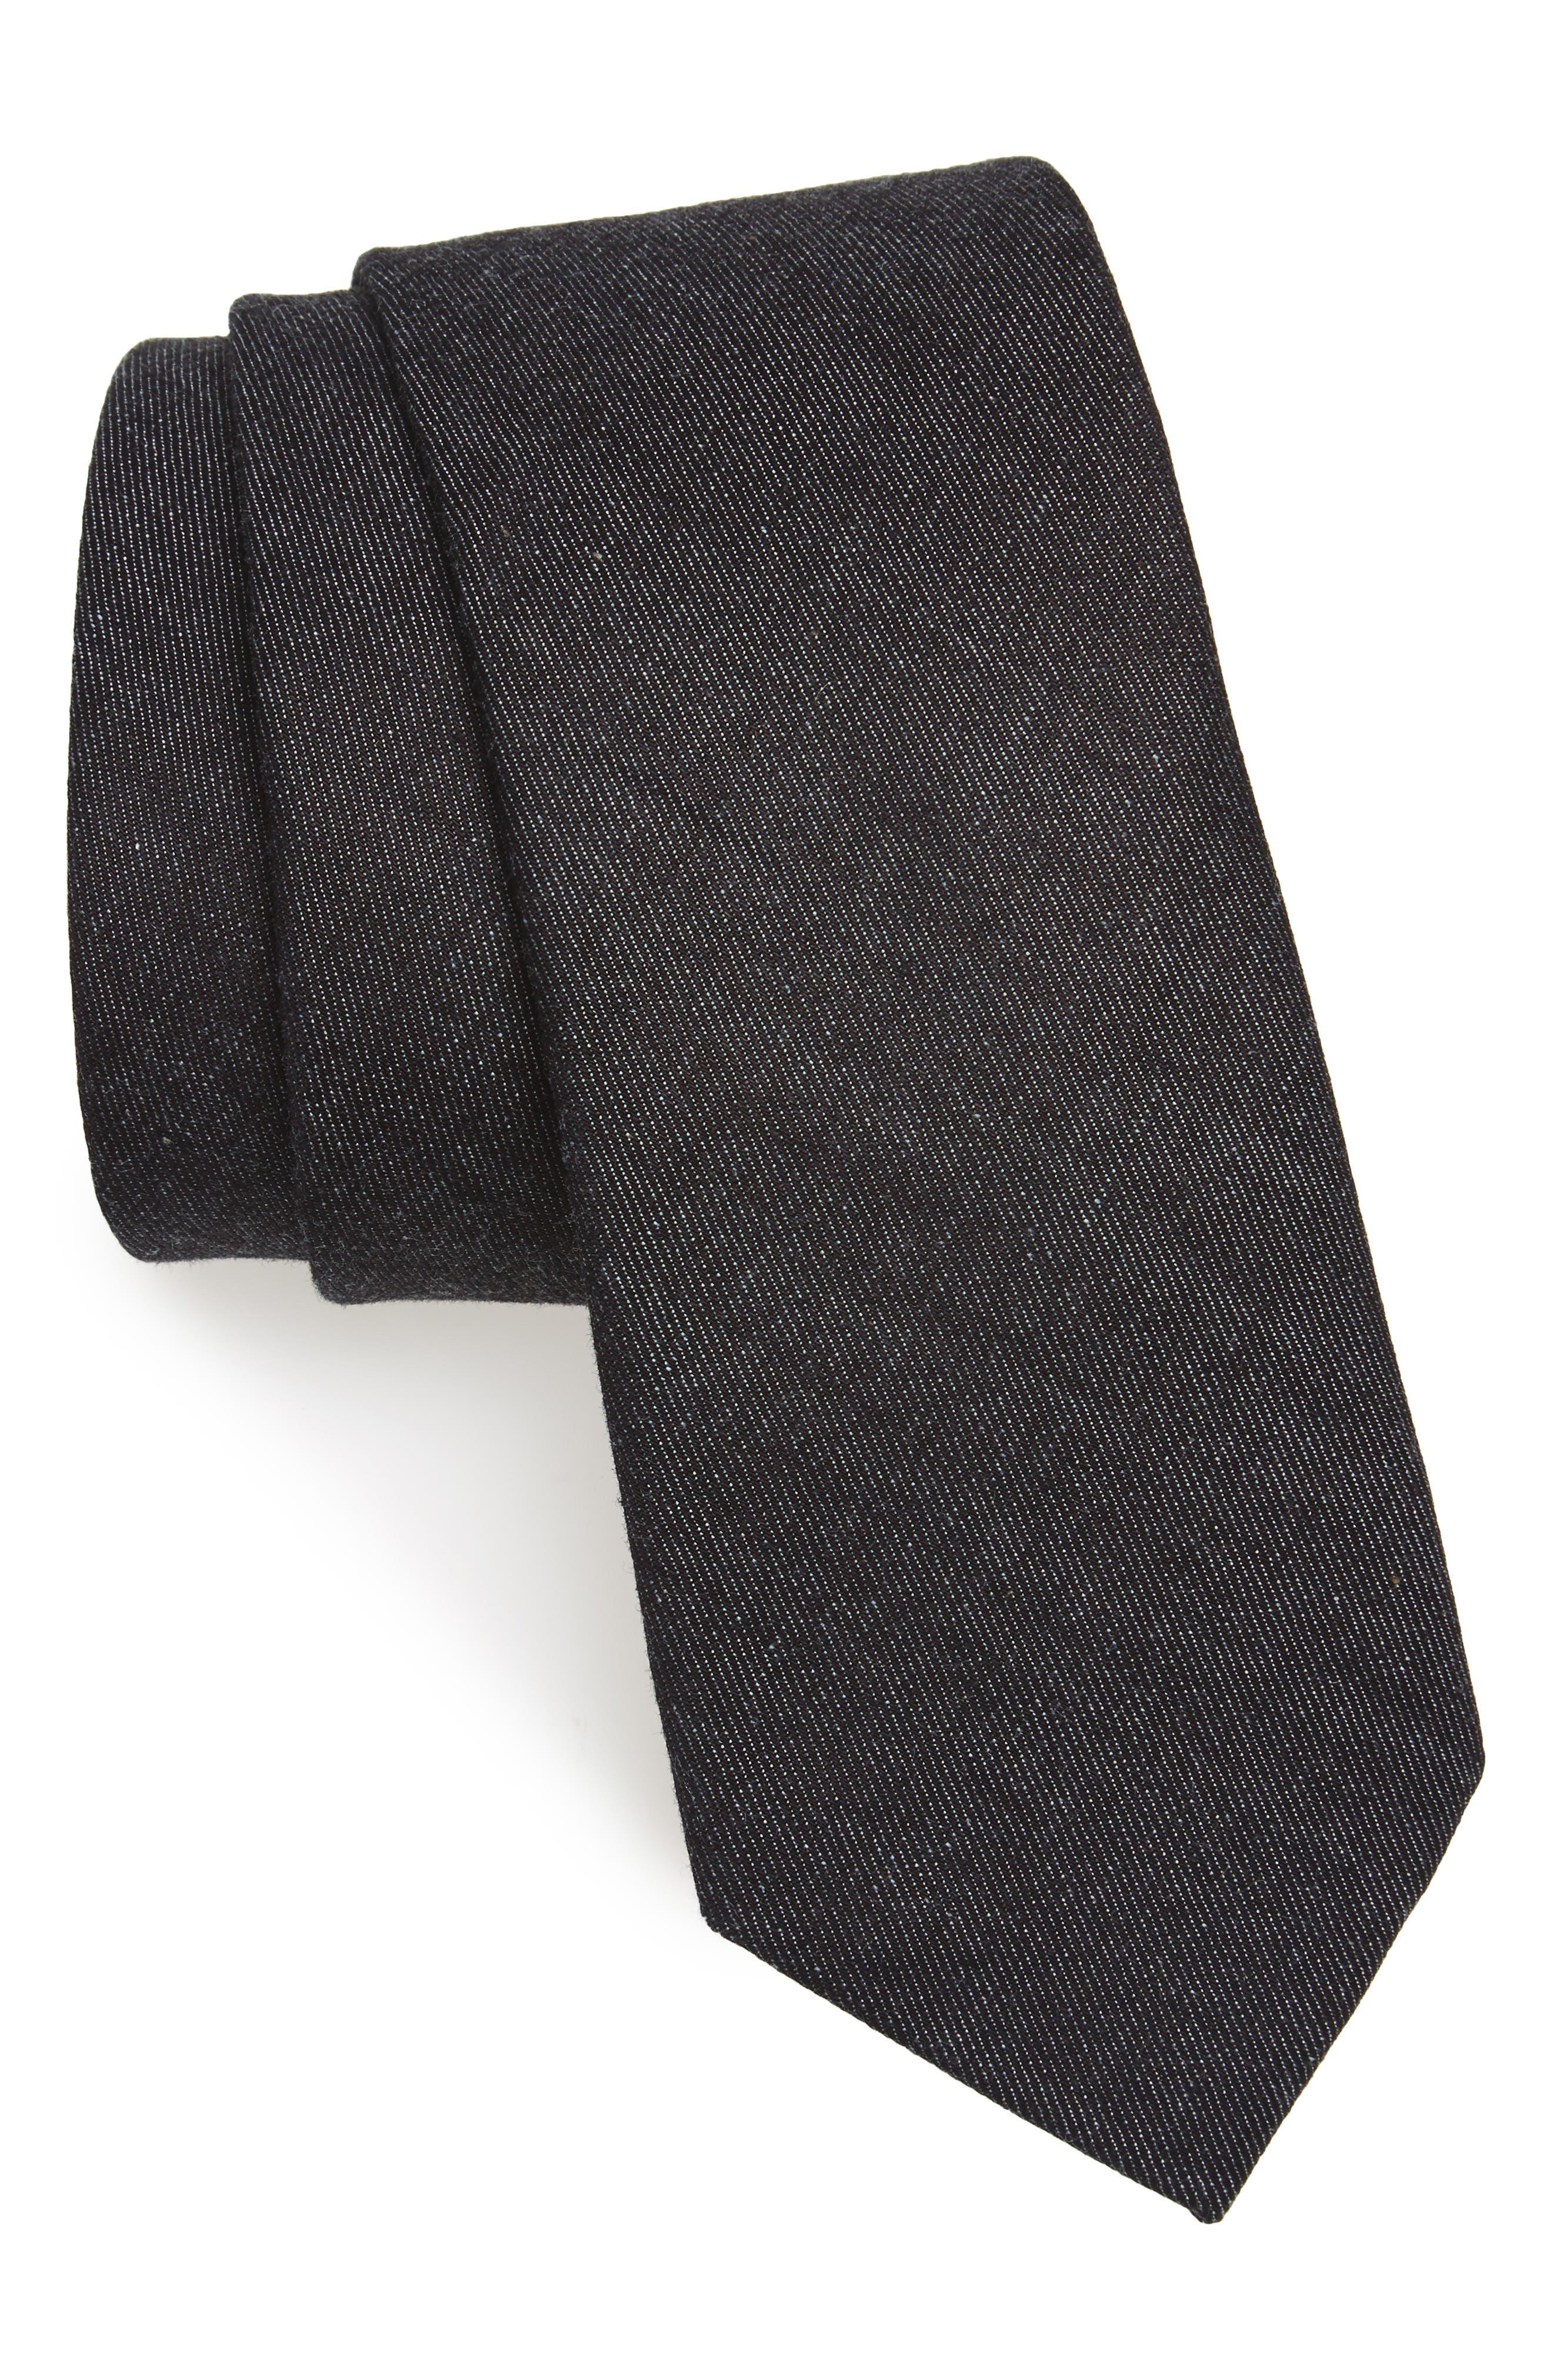 Bartlett Solid Cotton Tie,                             Main thumbnail 1, color,                             Black